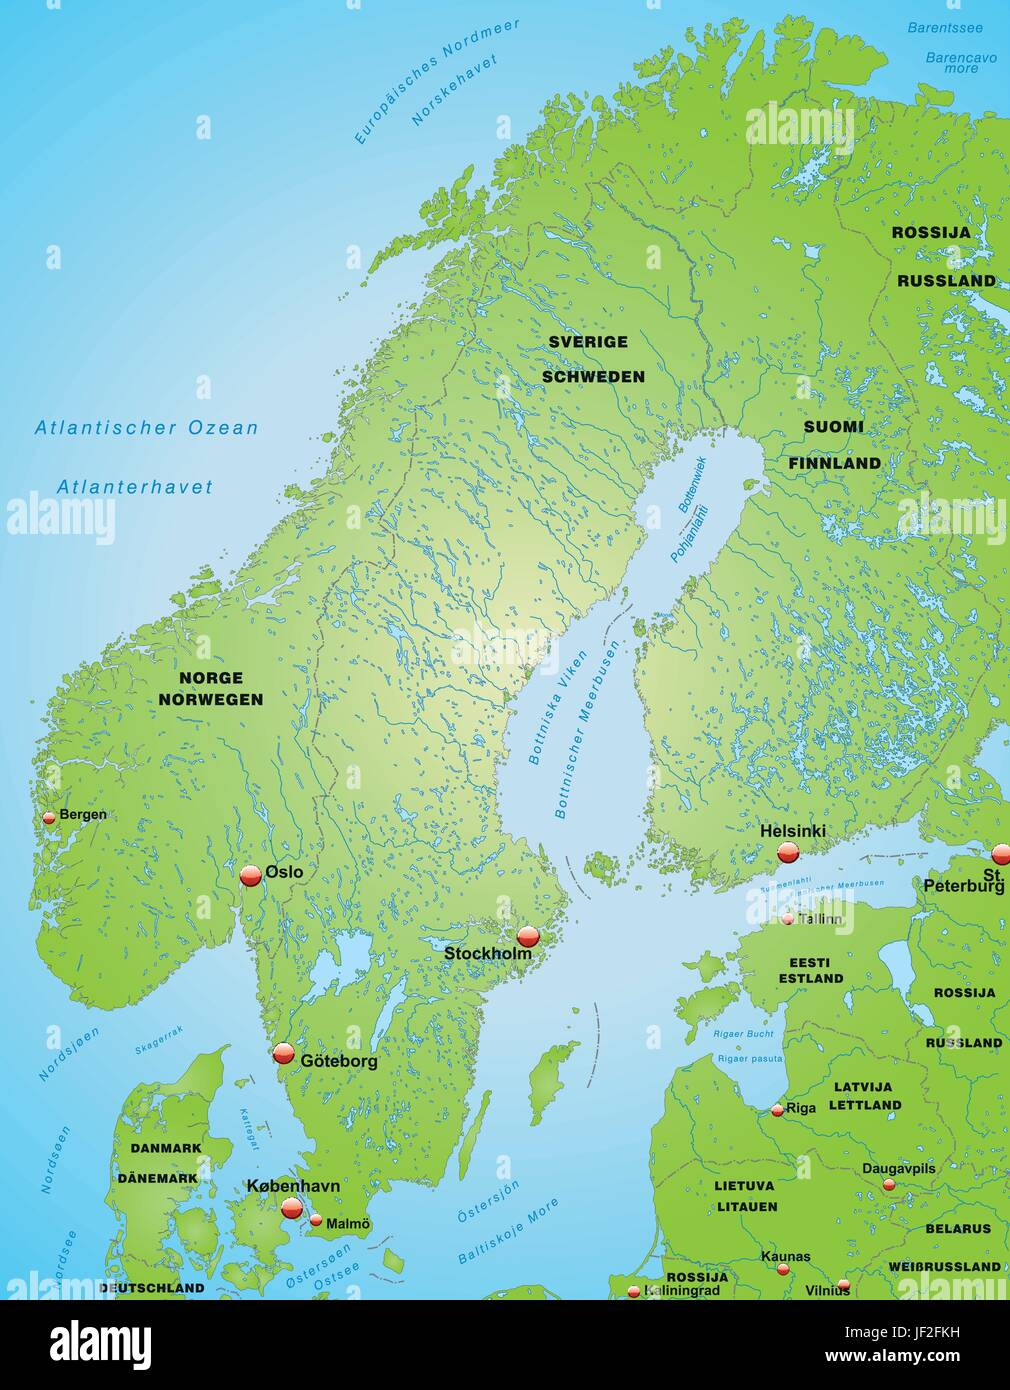 Map Of Scandinavia Stock Vector Art Illustration Vector Image